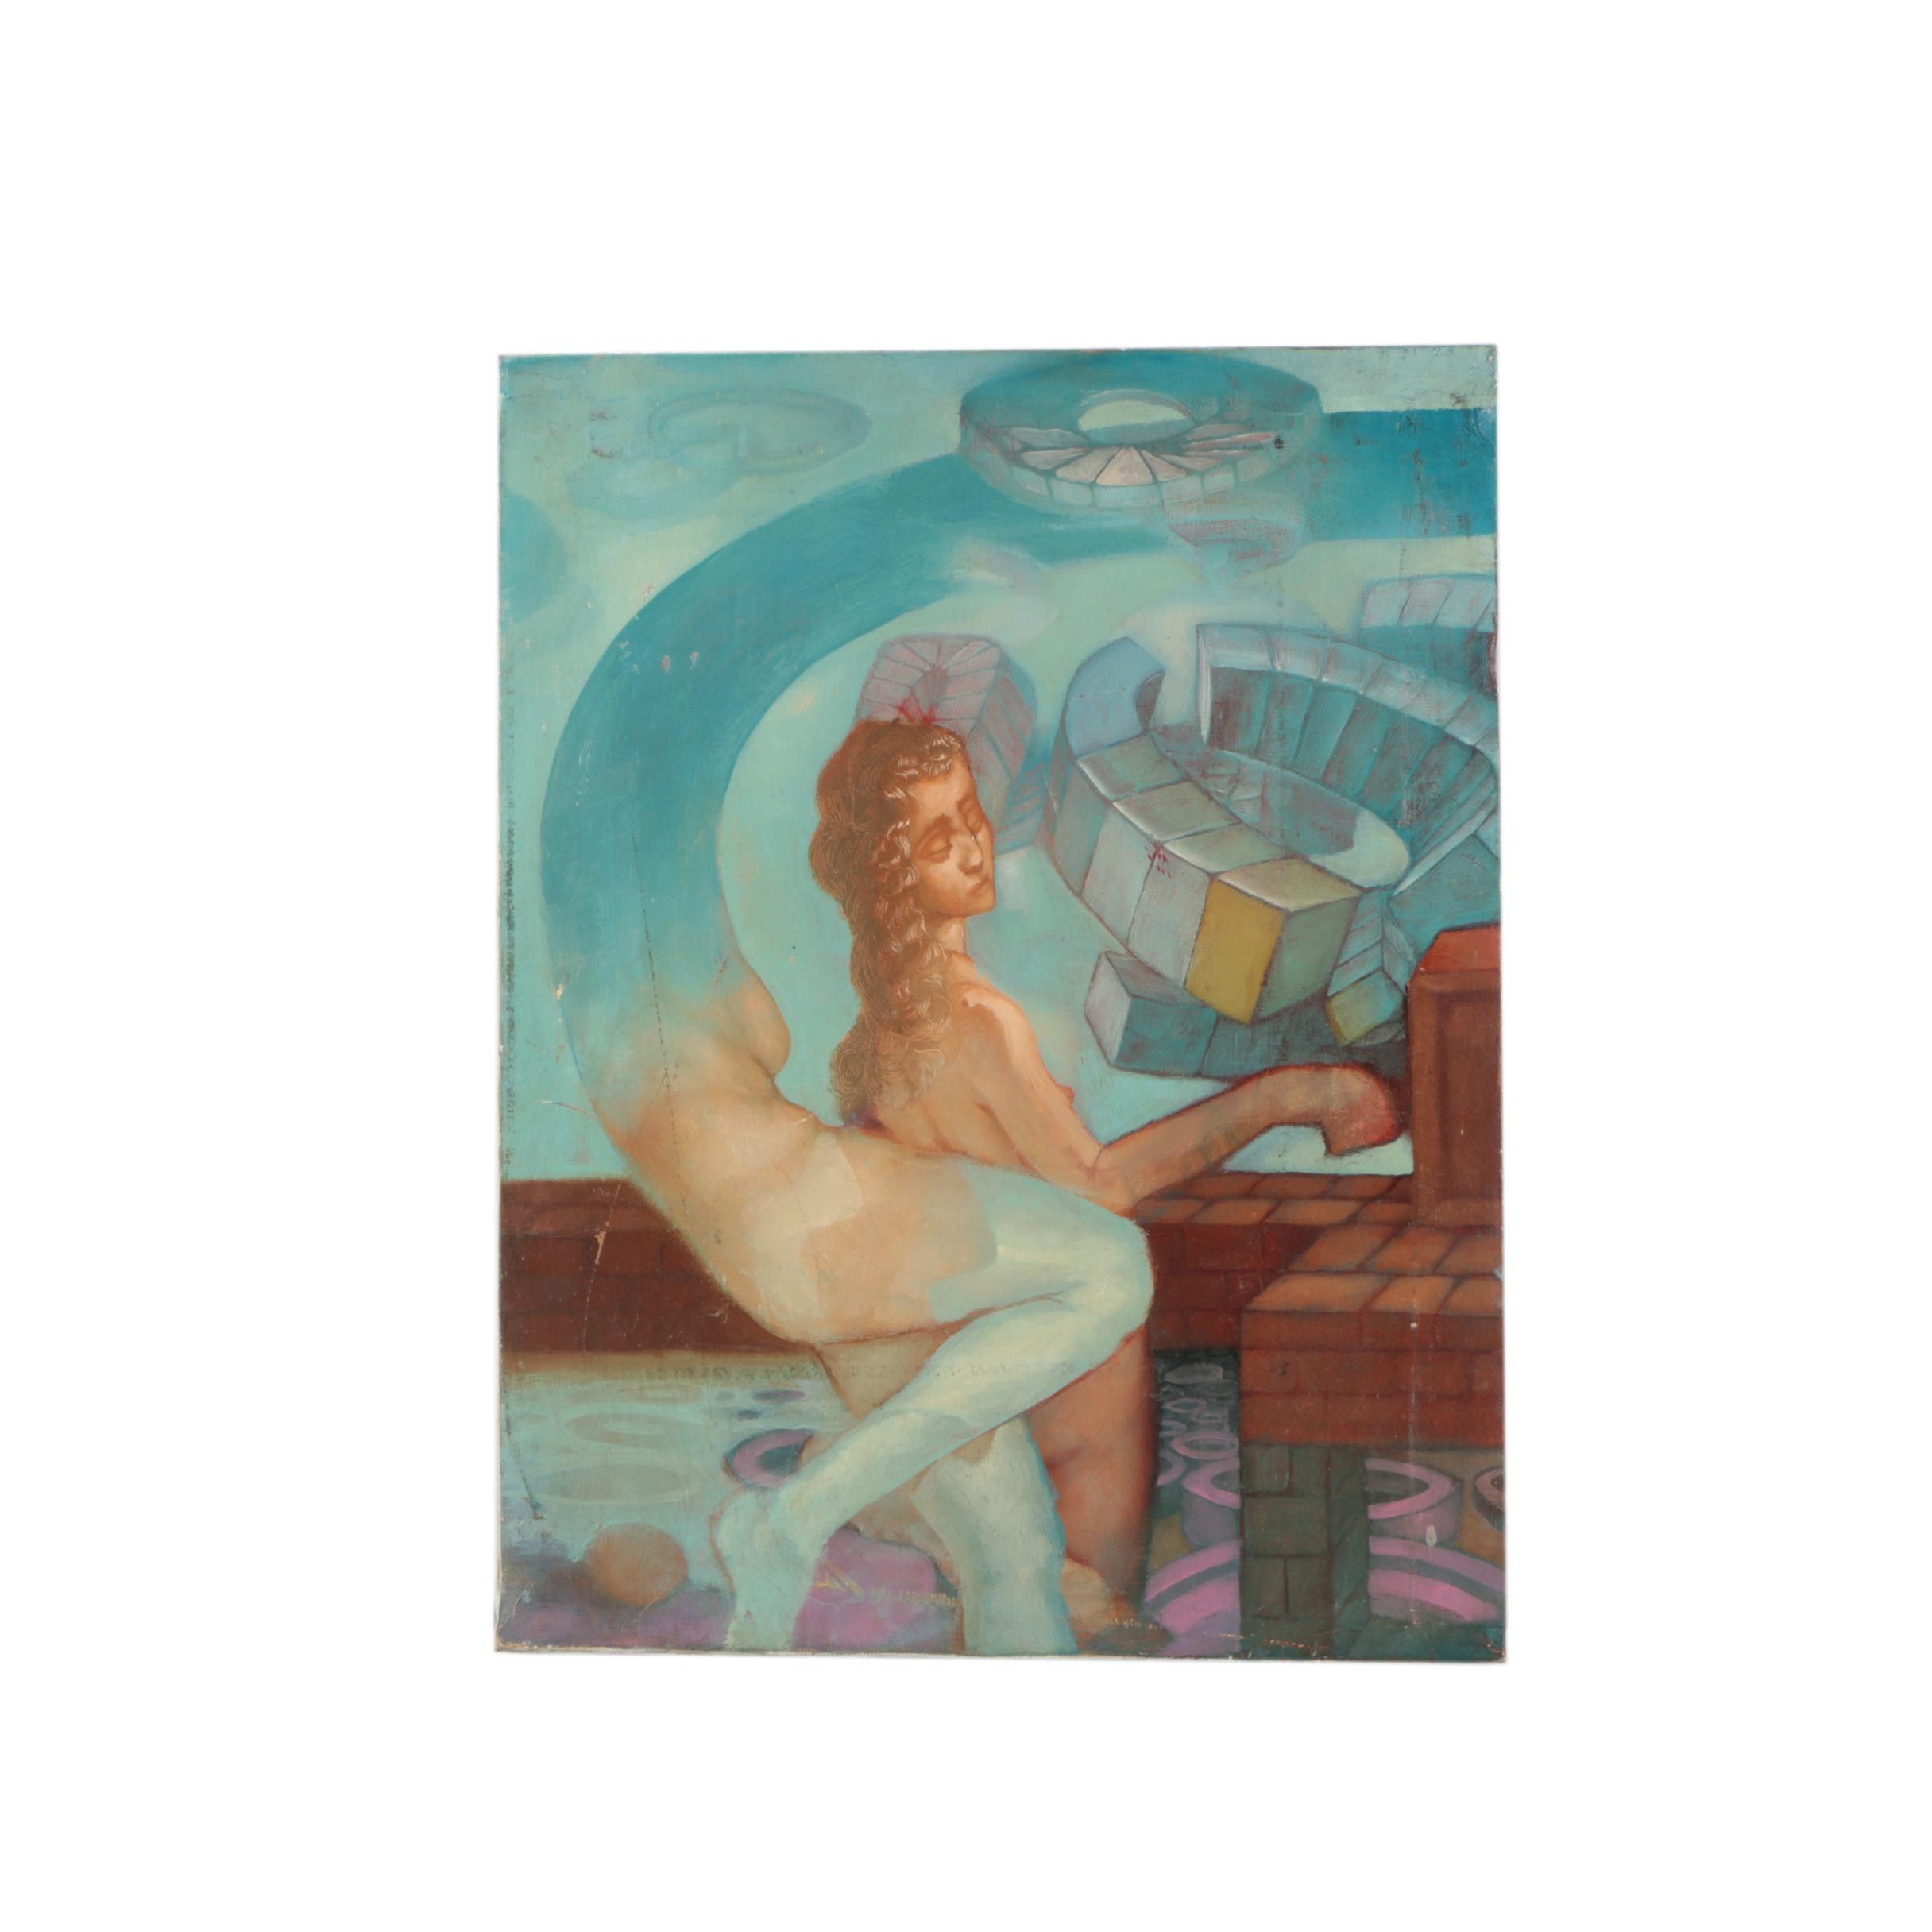 Oil Painting on Canvas of Surrealist Scene